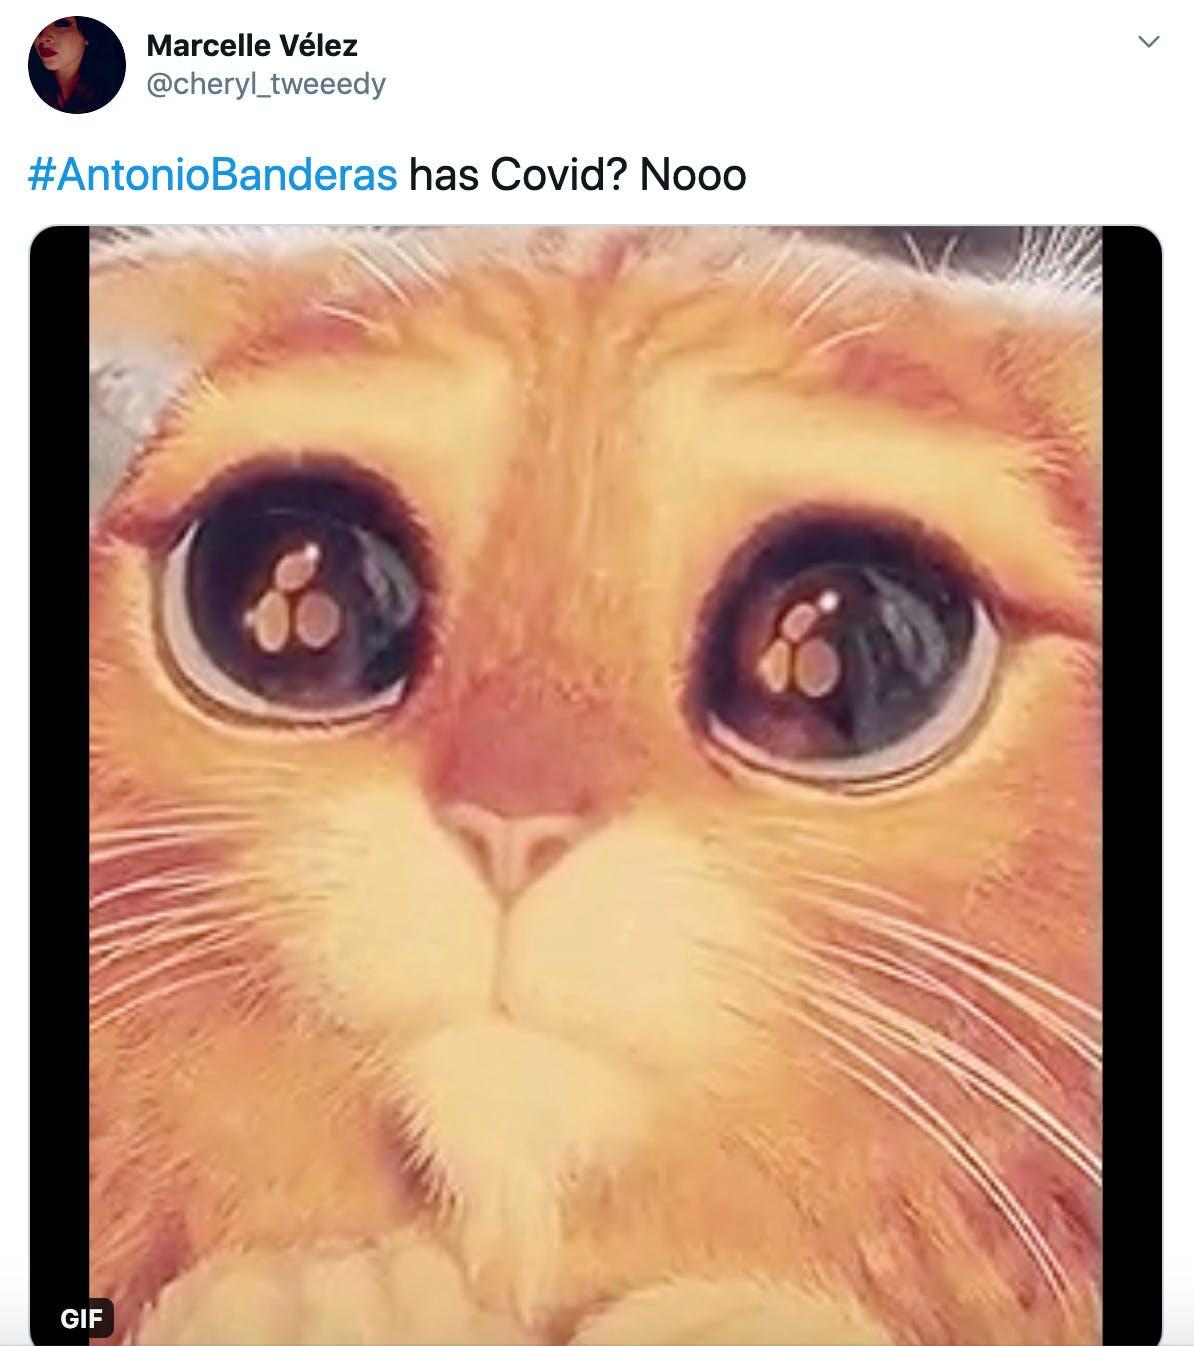 """#AntonioBanderas has Covid? Nooo"" gif of Puss in Boots from Shrek making big sad eyes"